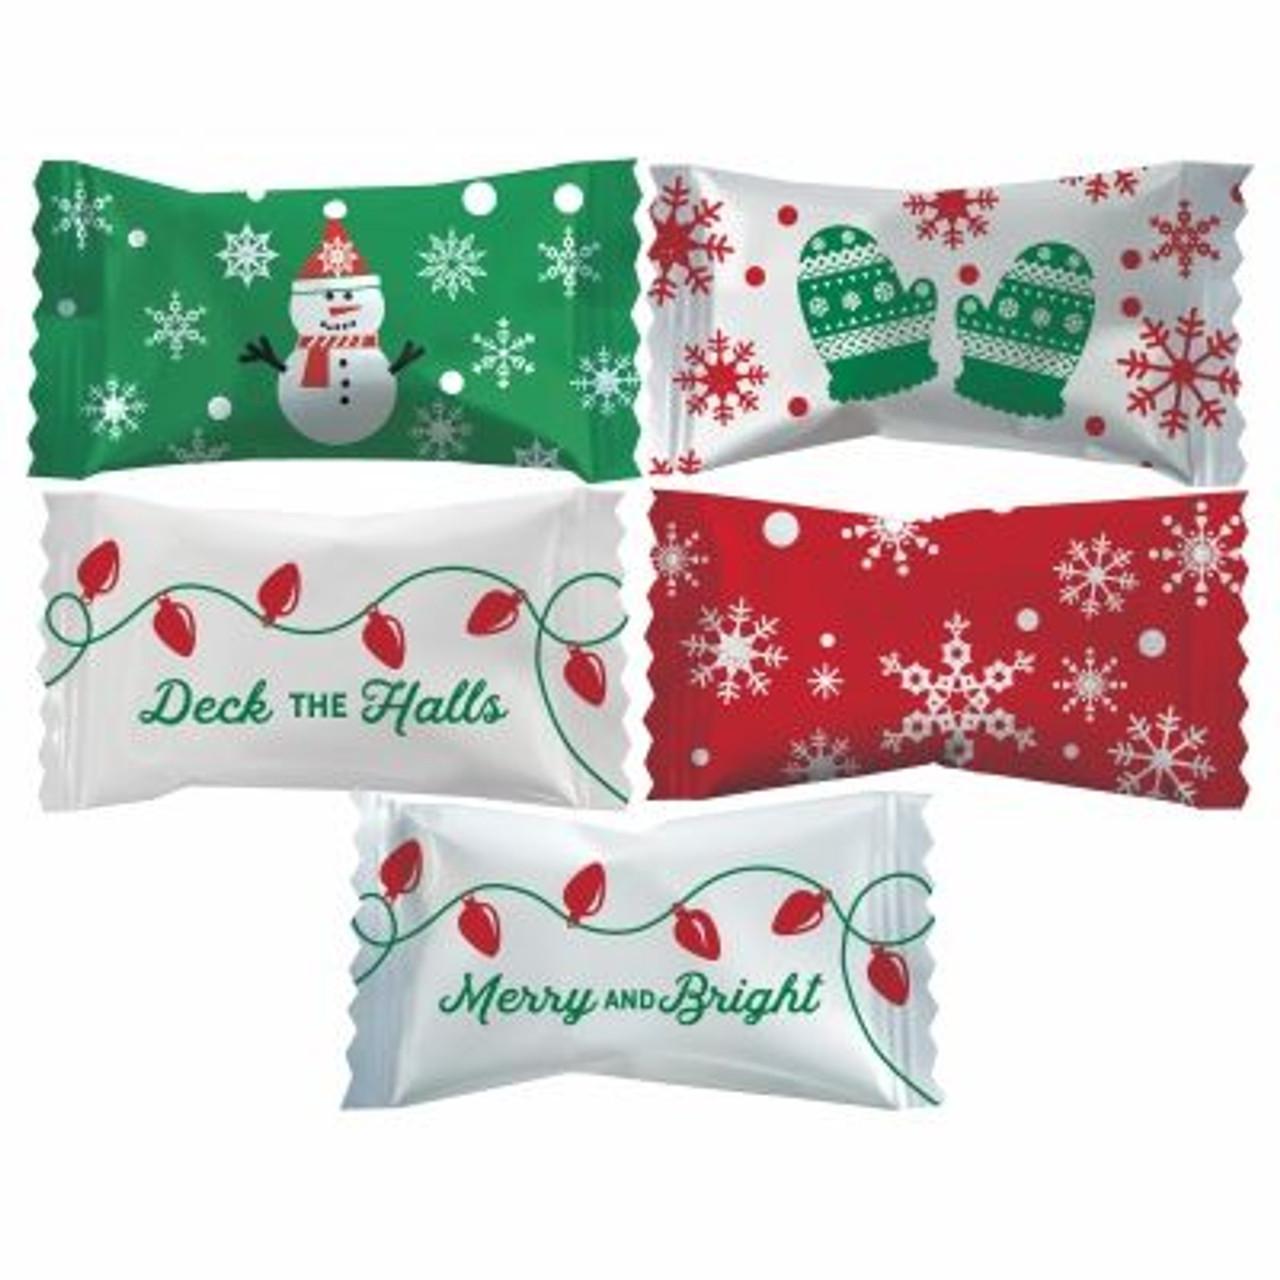 Merry & Bright Assortment Mints